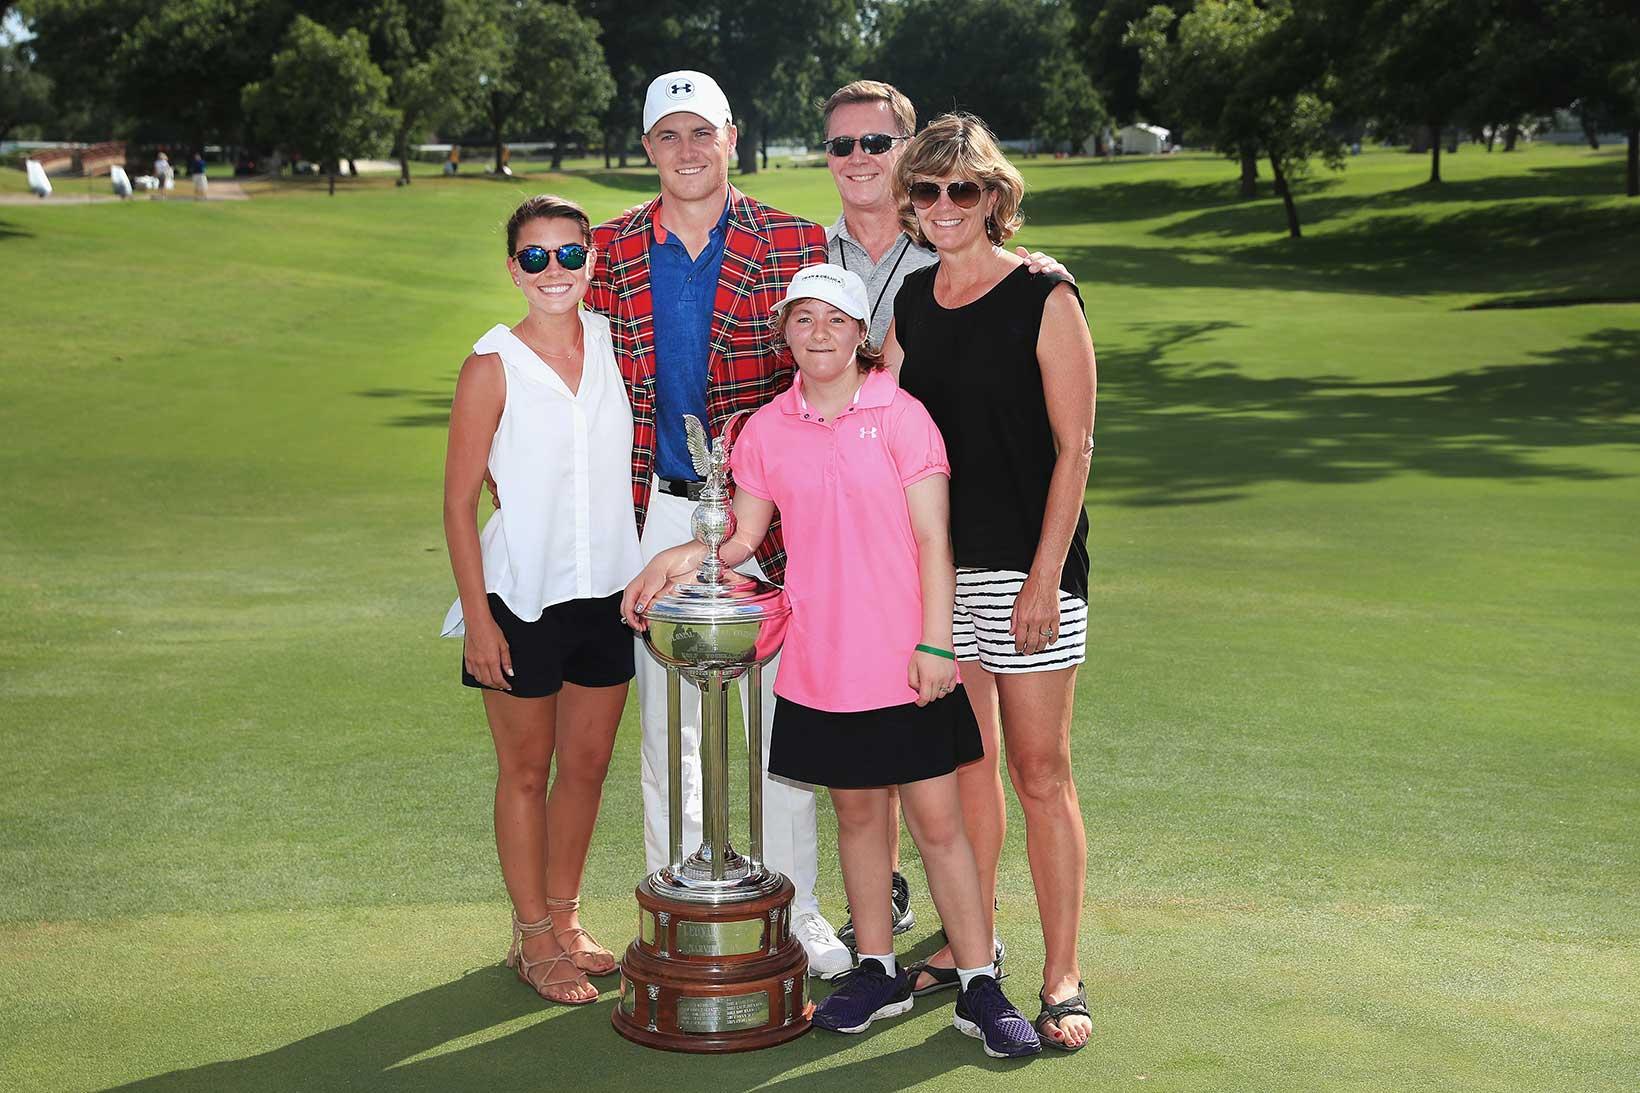 2016 Dean & Deluca Invitational: Final Round - A Family Portrait